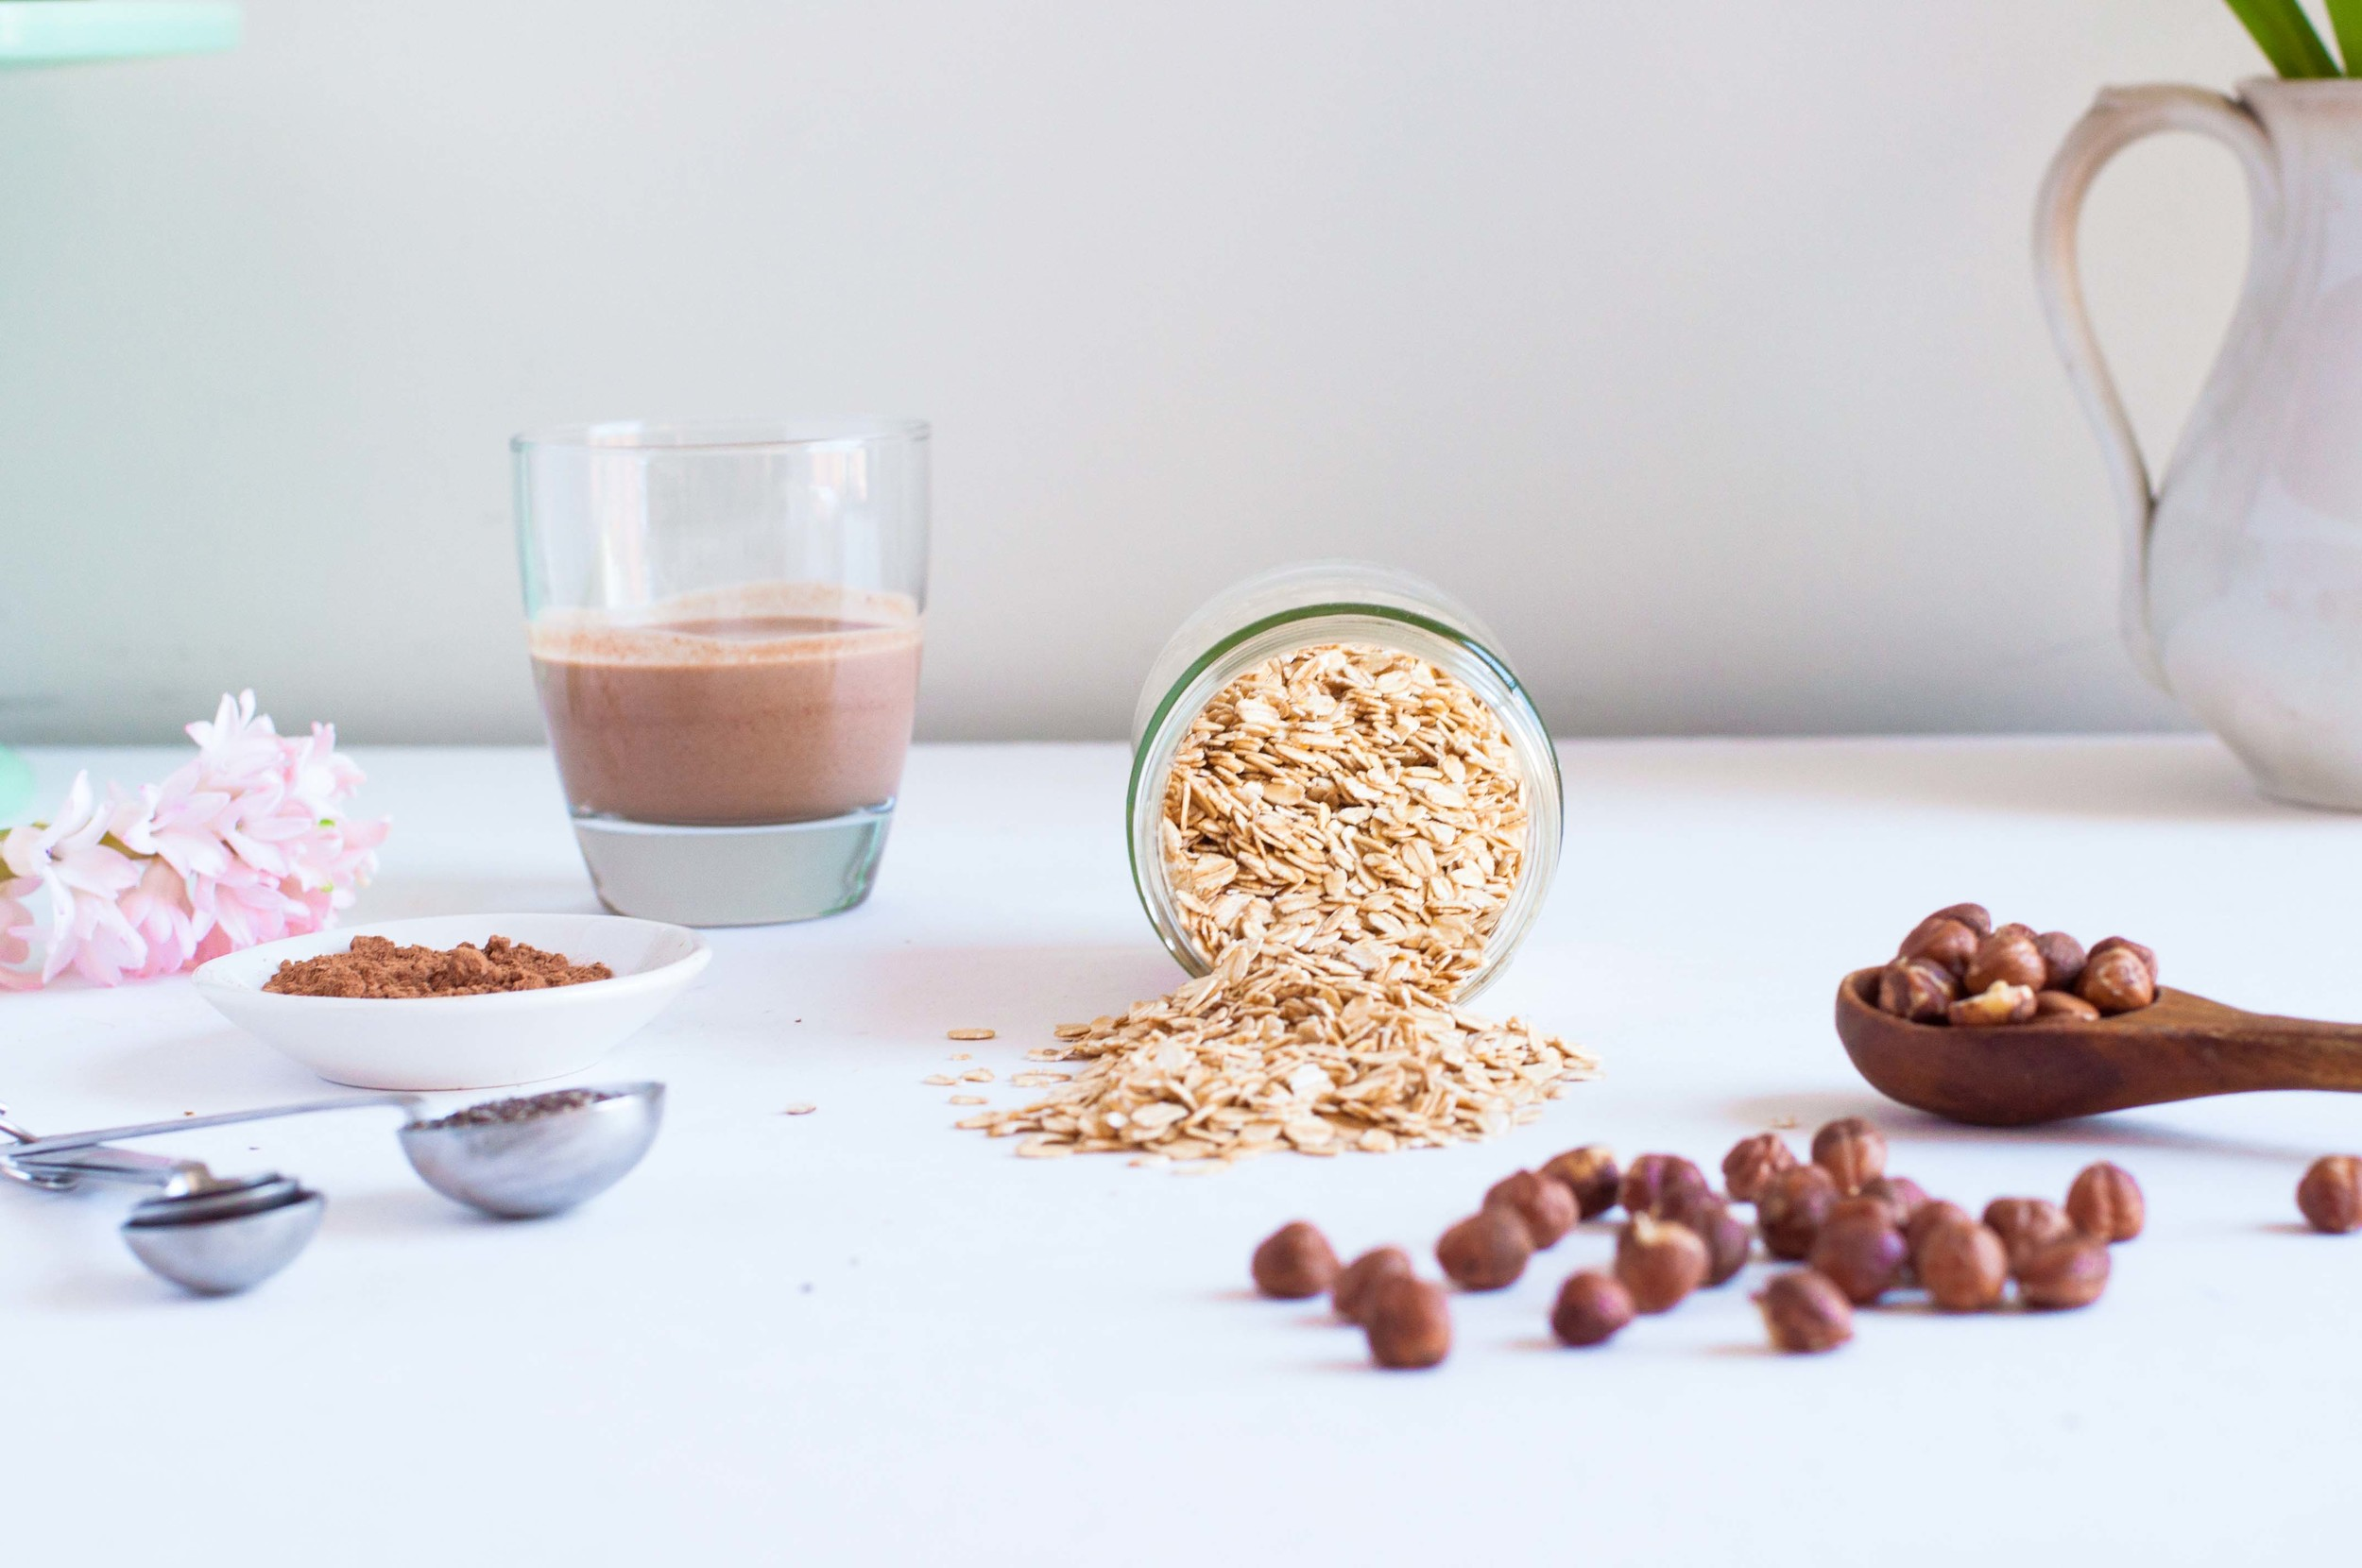 chocolate-hazelnut-overnight-oats-vegan-fried-parsley